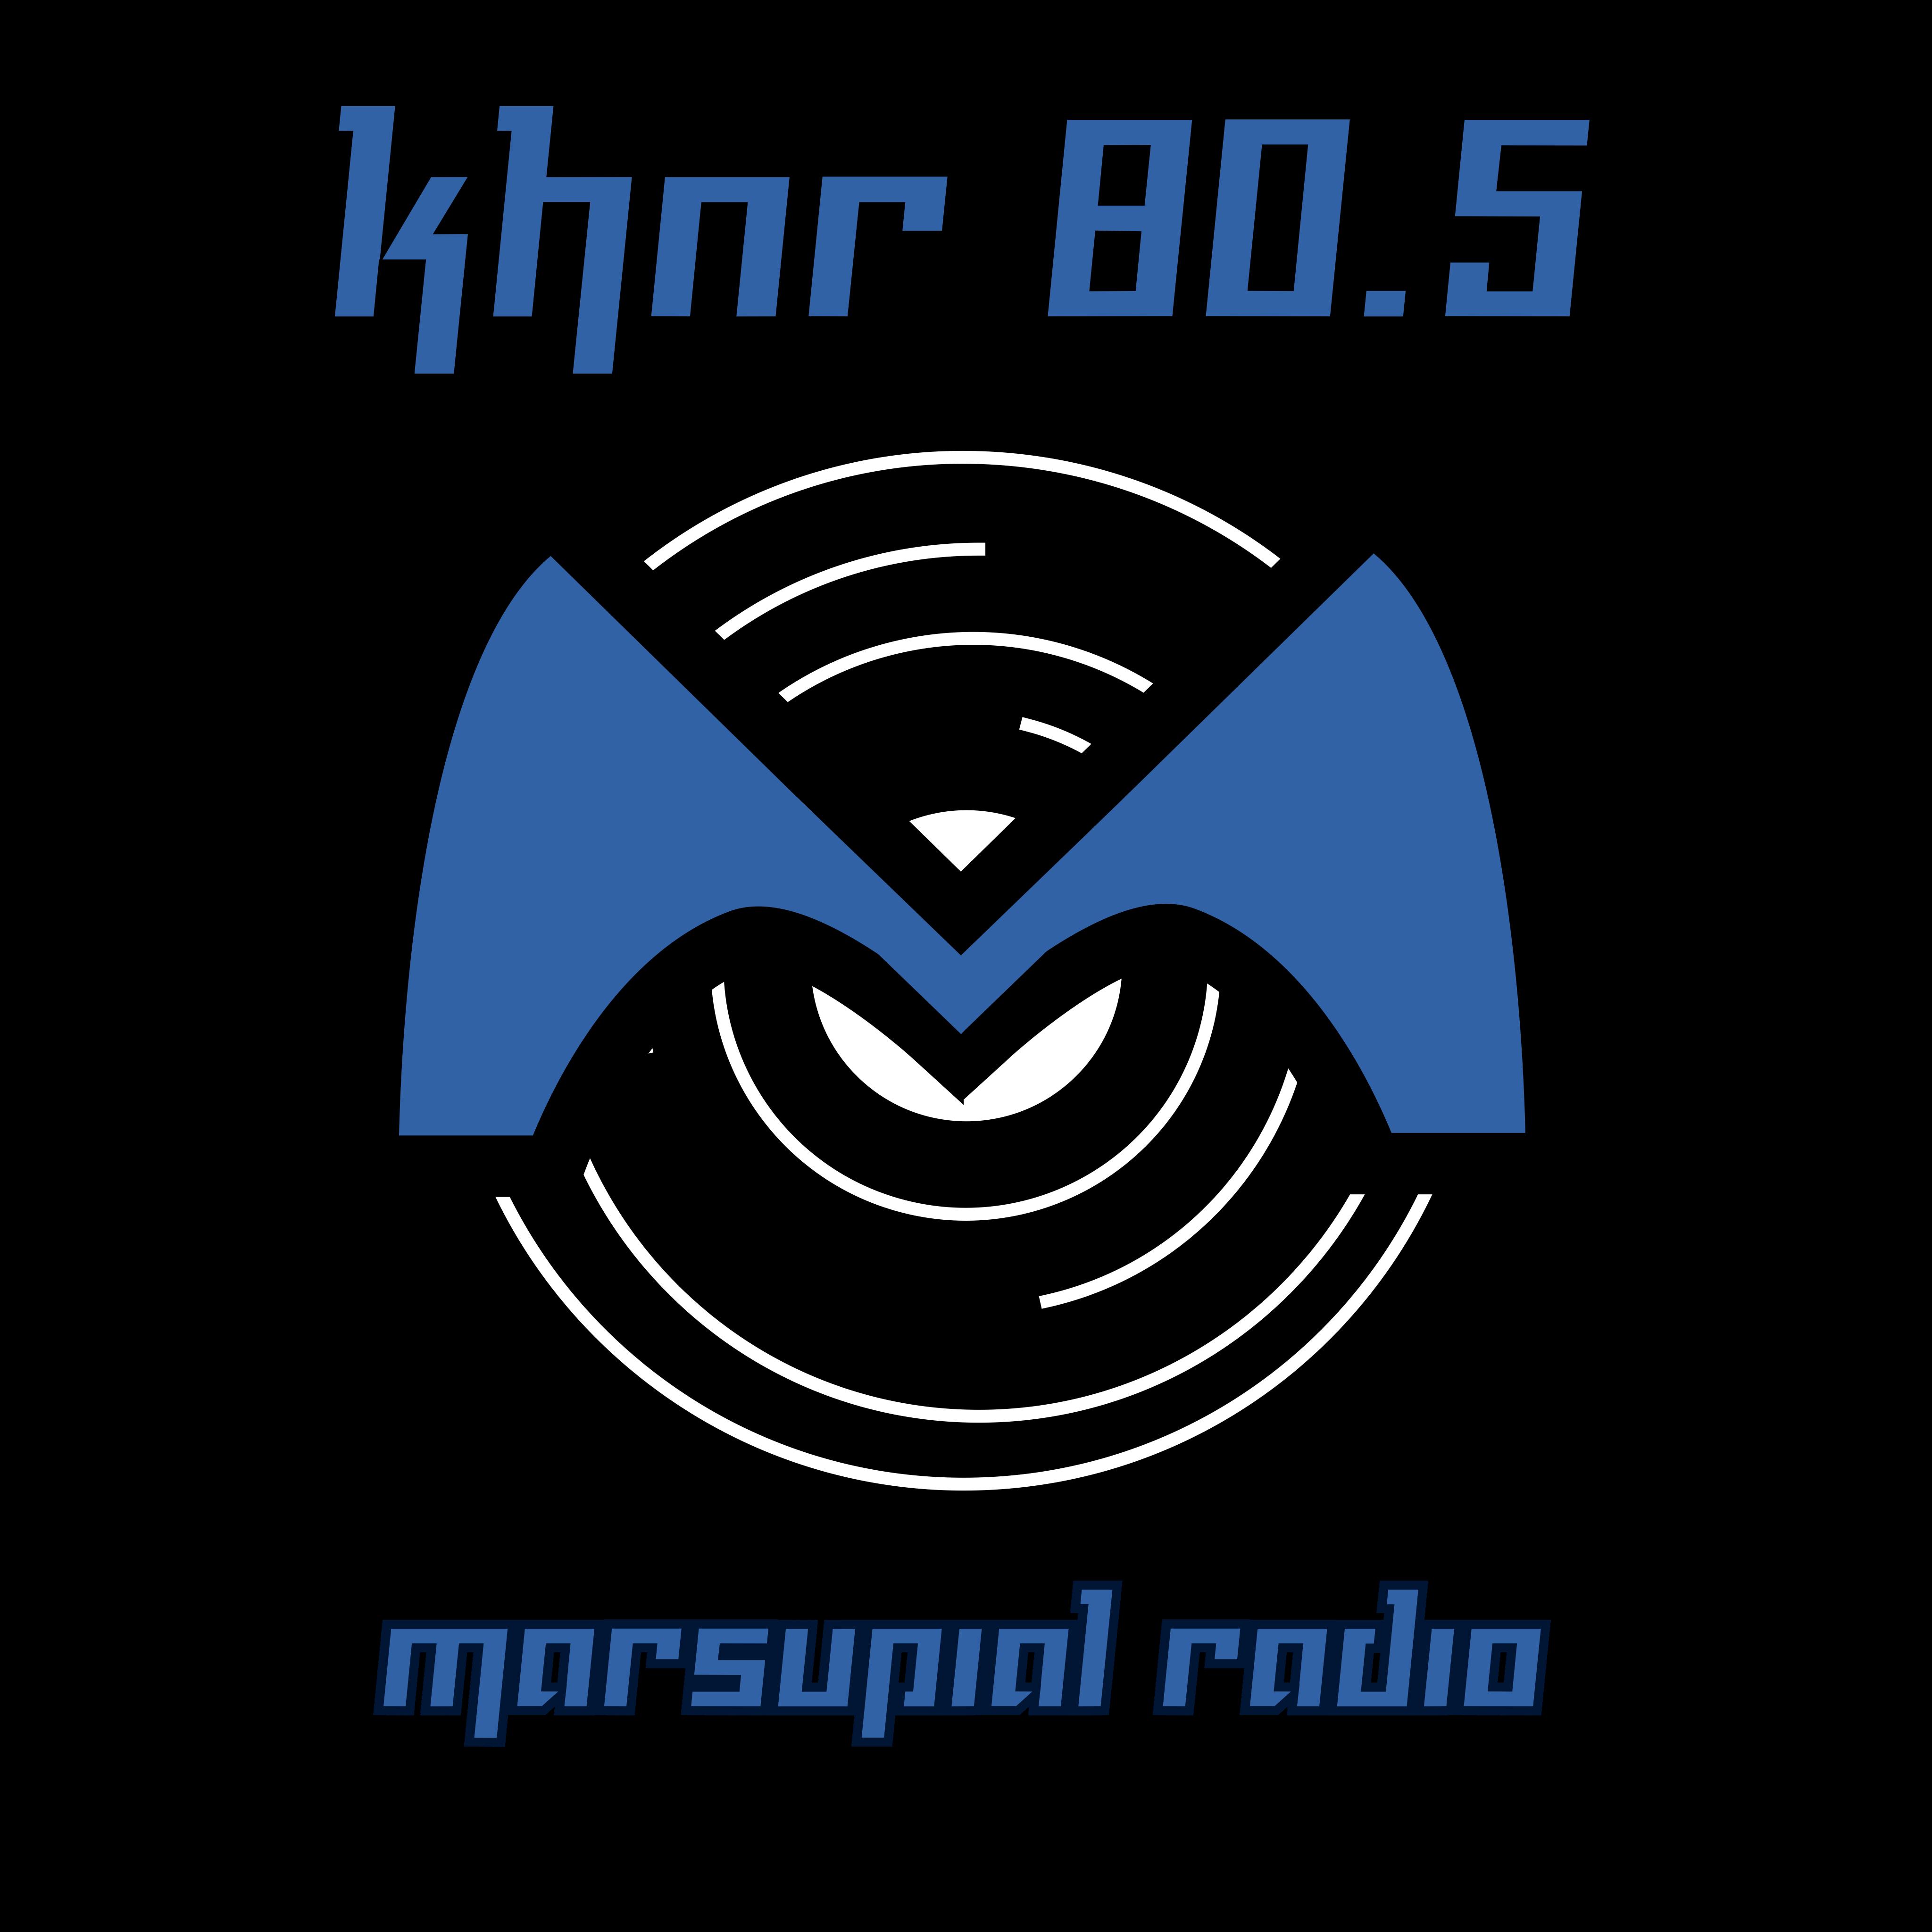 KHNR 80.5 Marsupial Radio